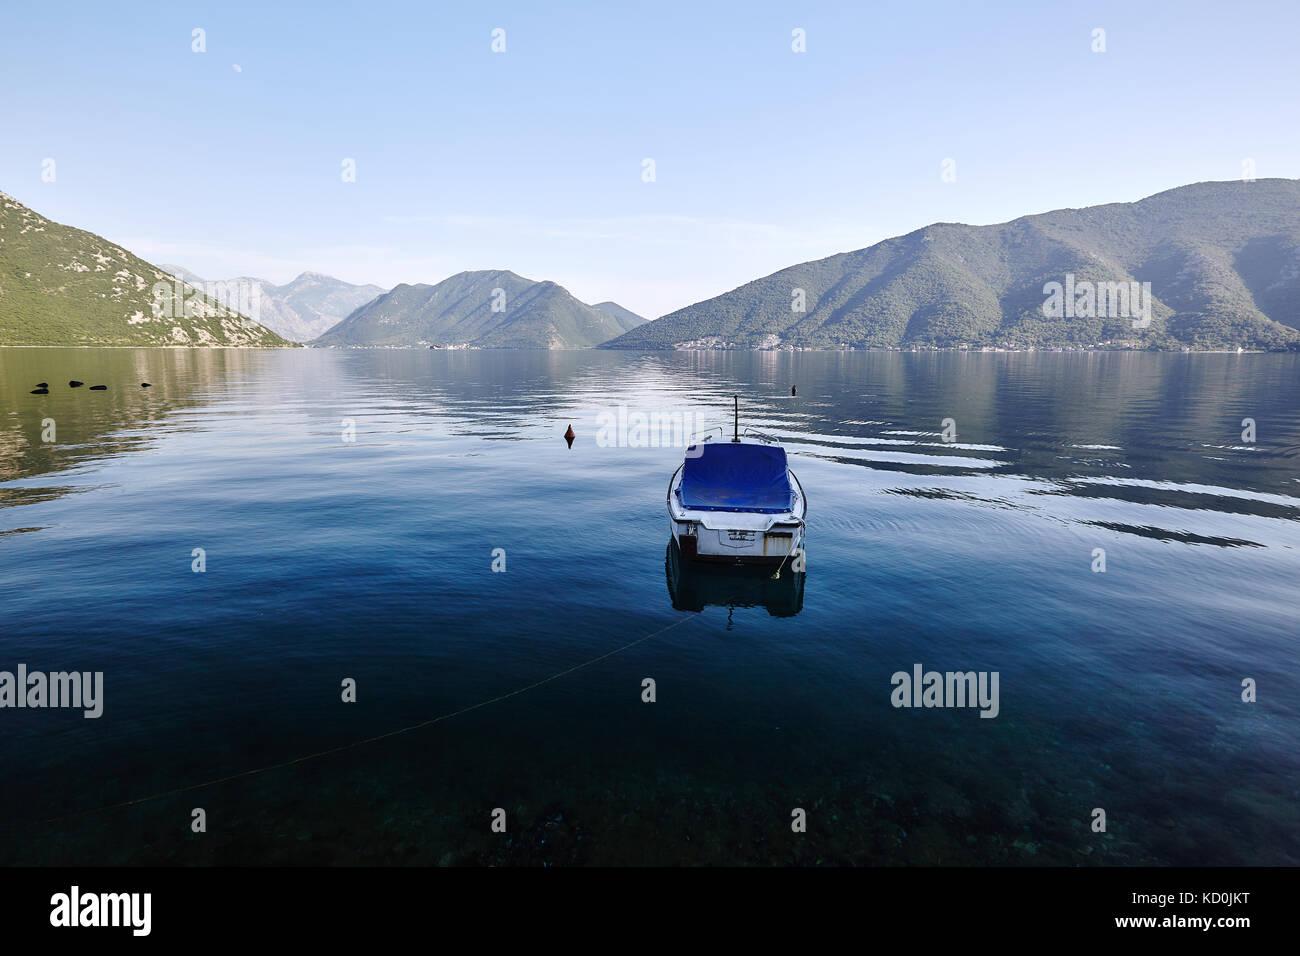 Motor boat anchored in Bay of Kotor, Montenegro - Stock Image